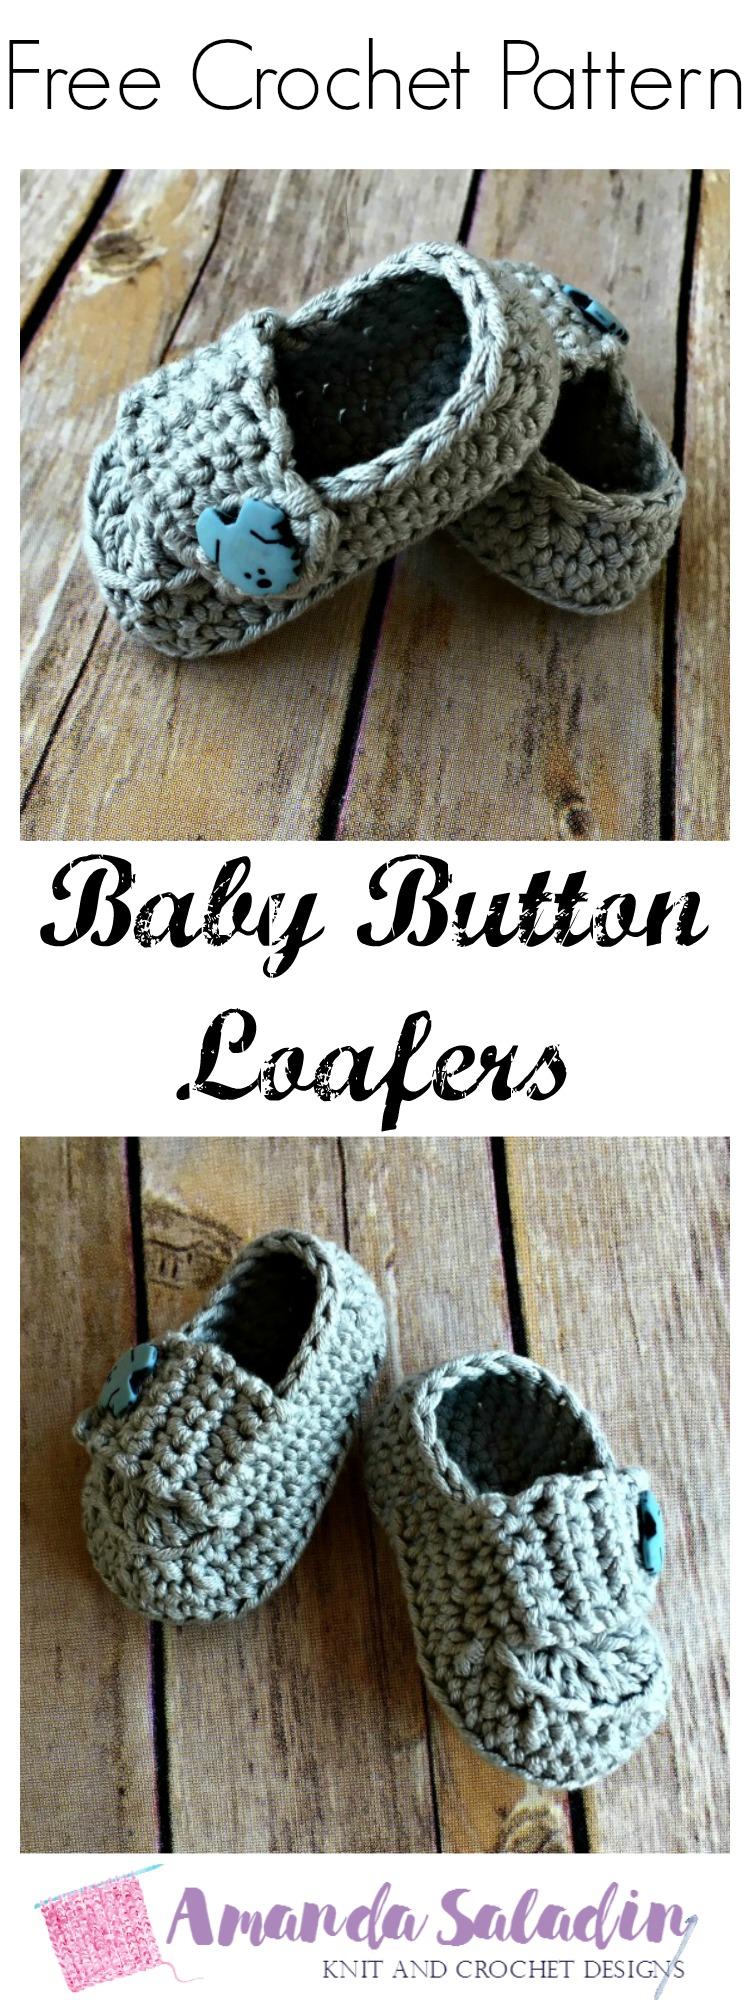 Baby Button Loafers - Free Crochet Pattern - Amanda Saladin